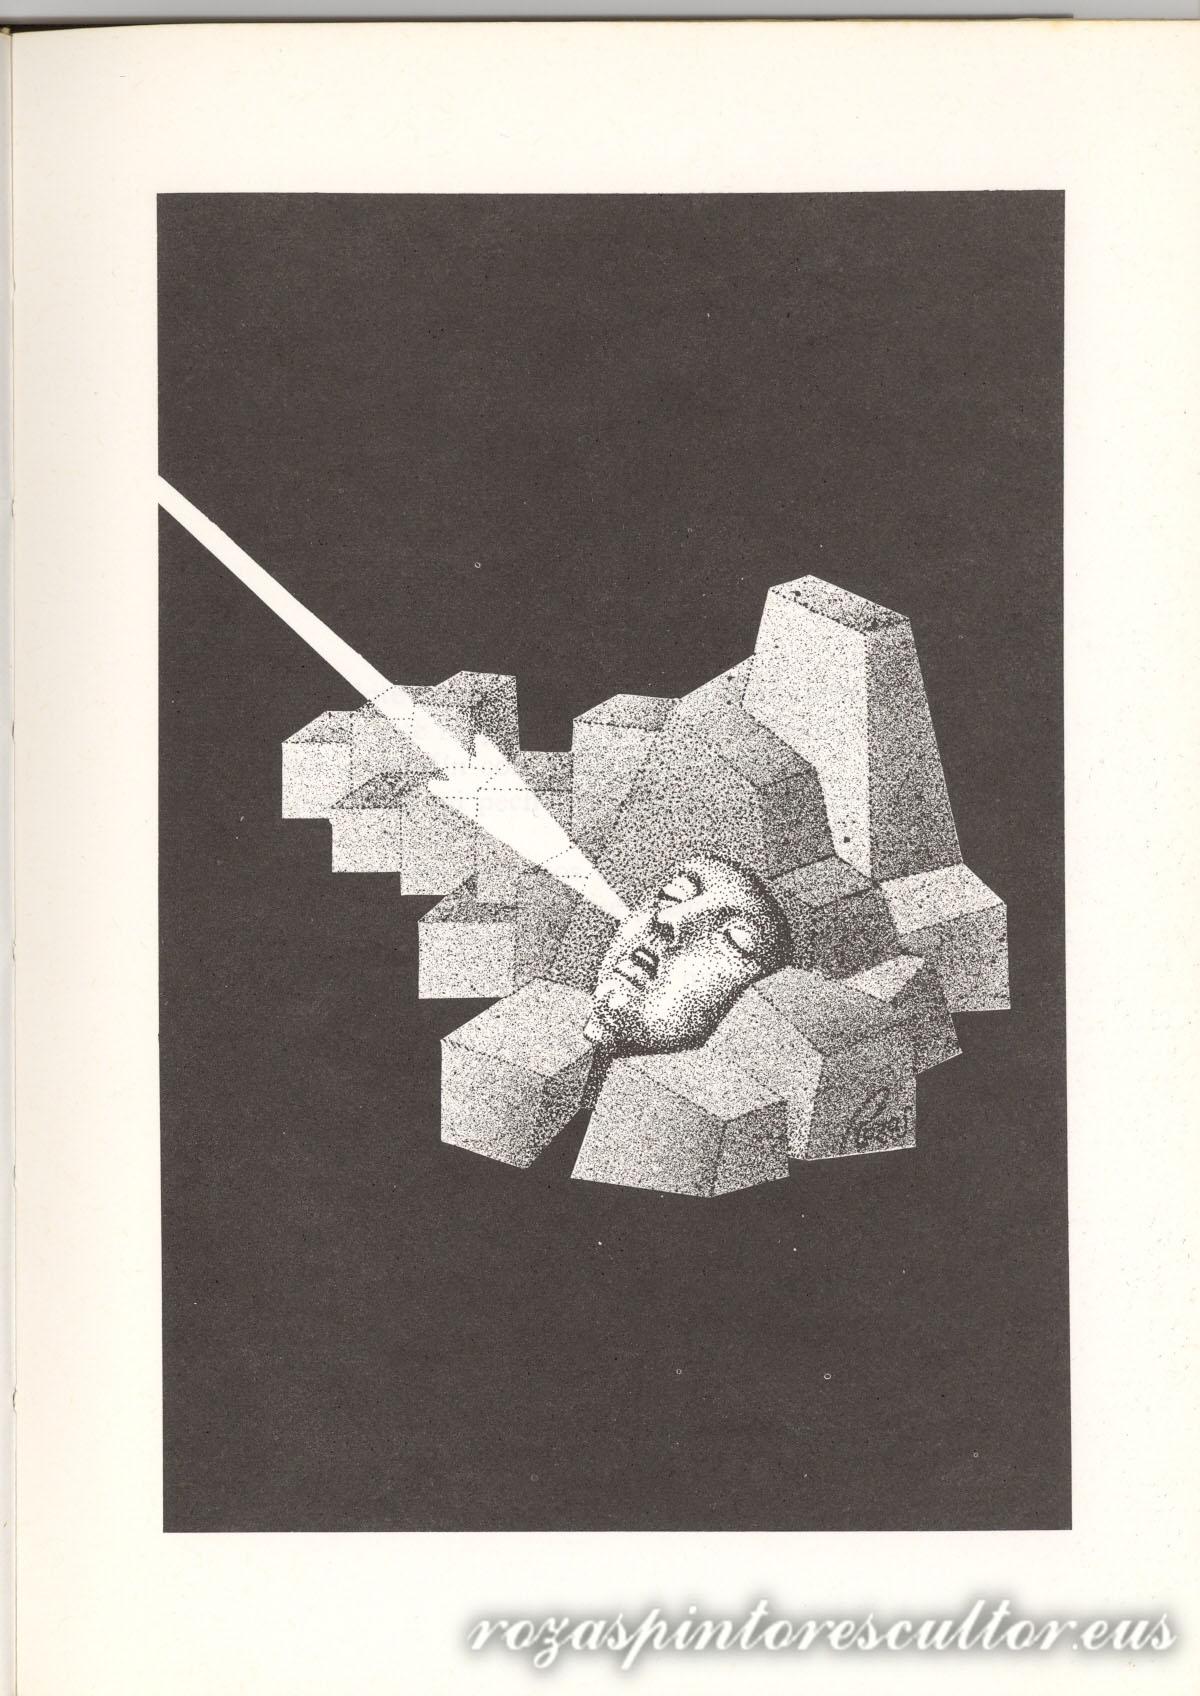 1983 Las moradas 4